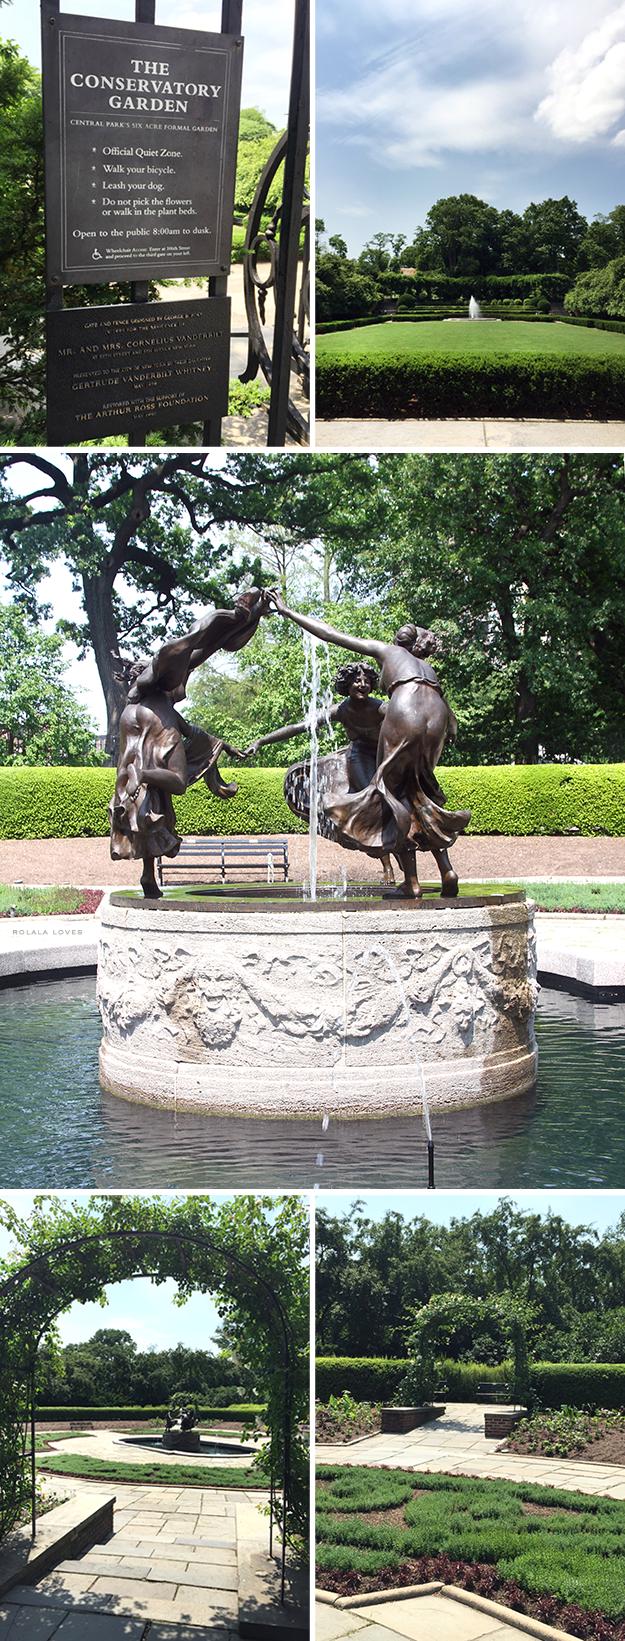 Untermyer Fountain Central Park Conservatory Garden